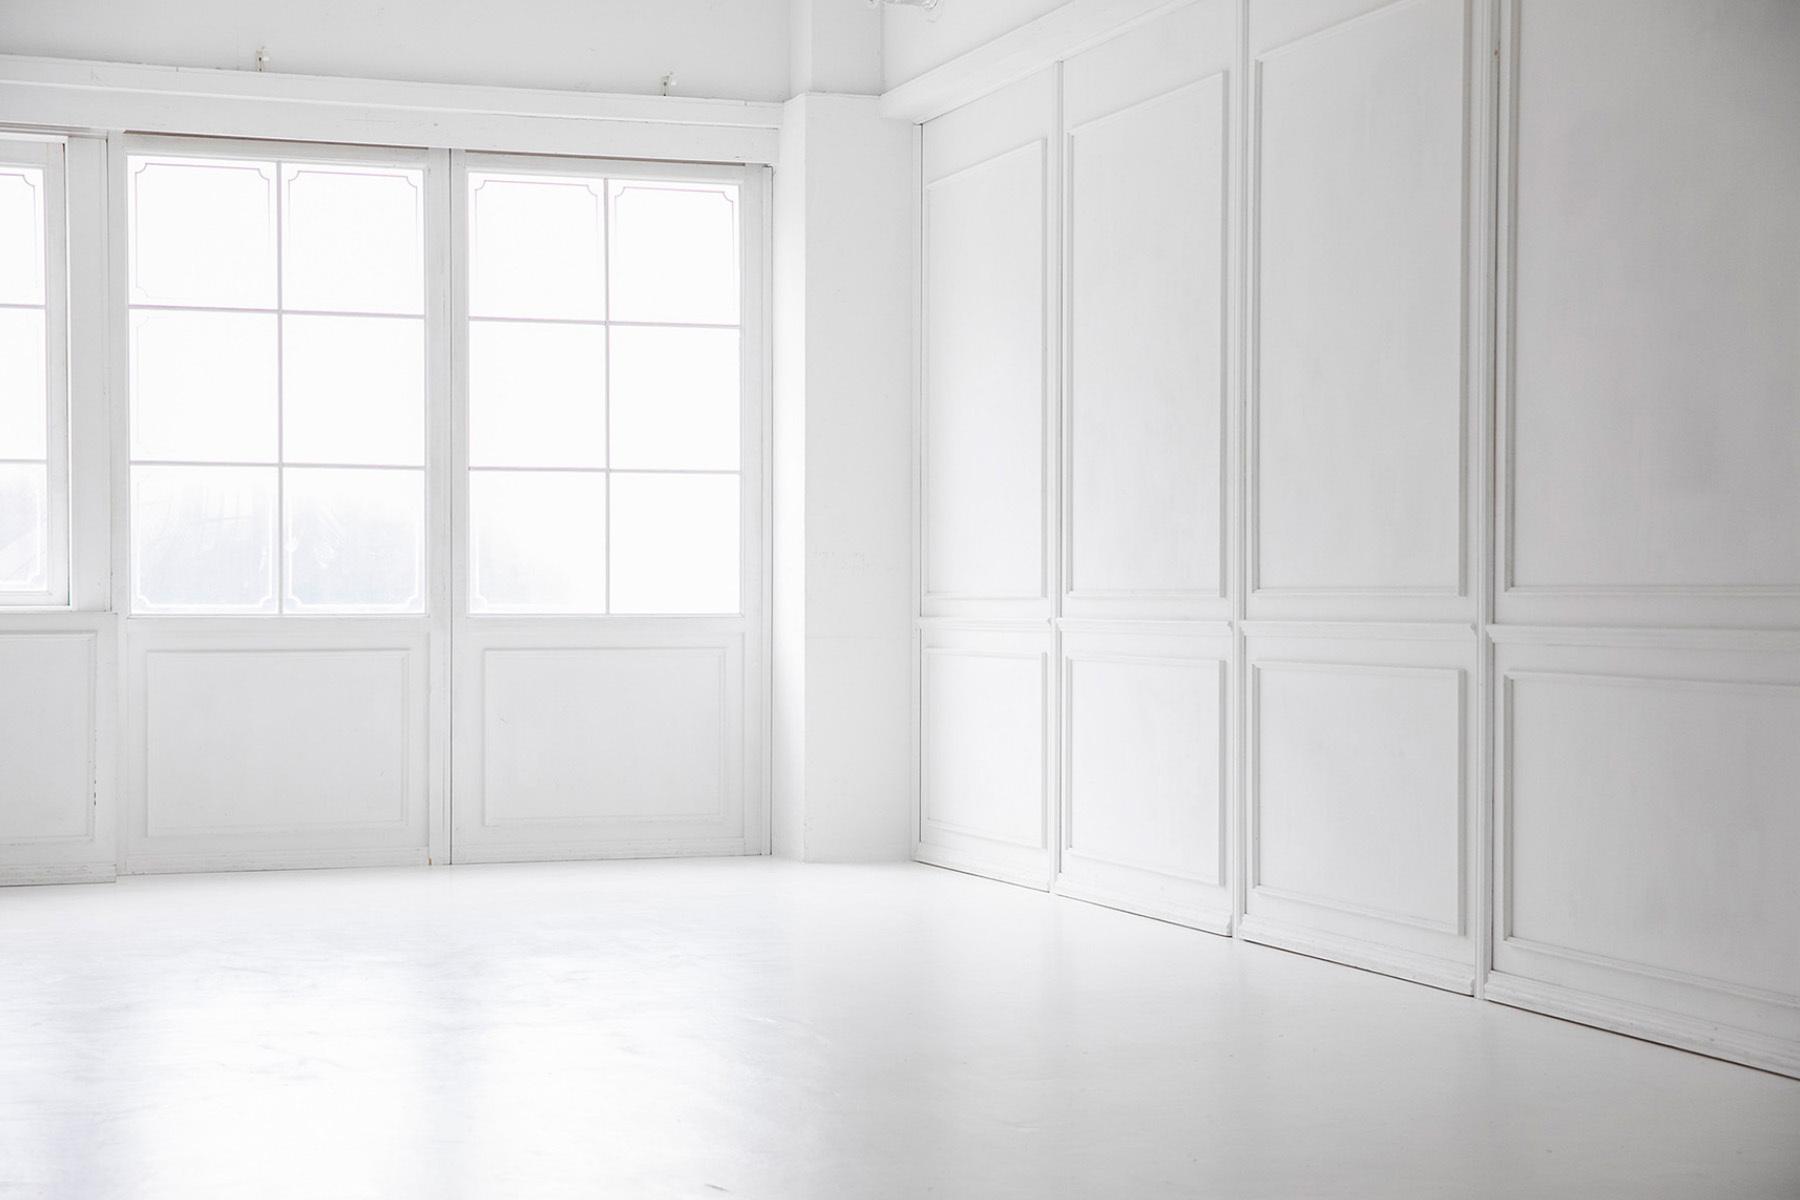 studio Mired(スタジオ ミレッド)ヨーロピアンな空間